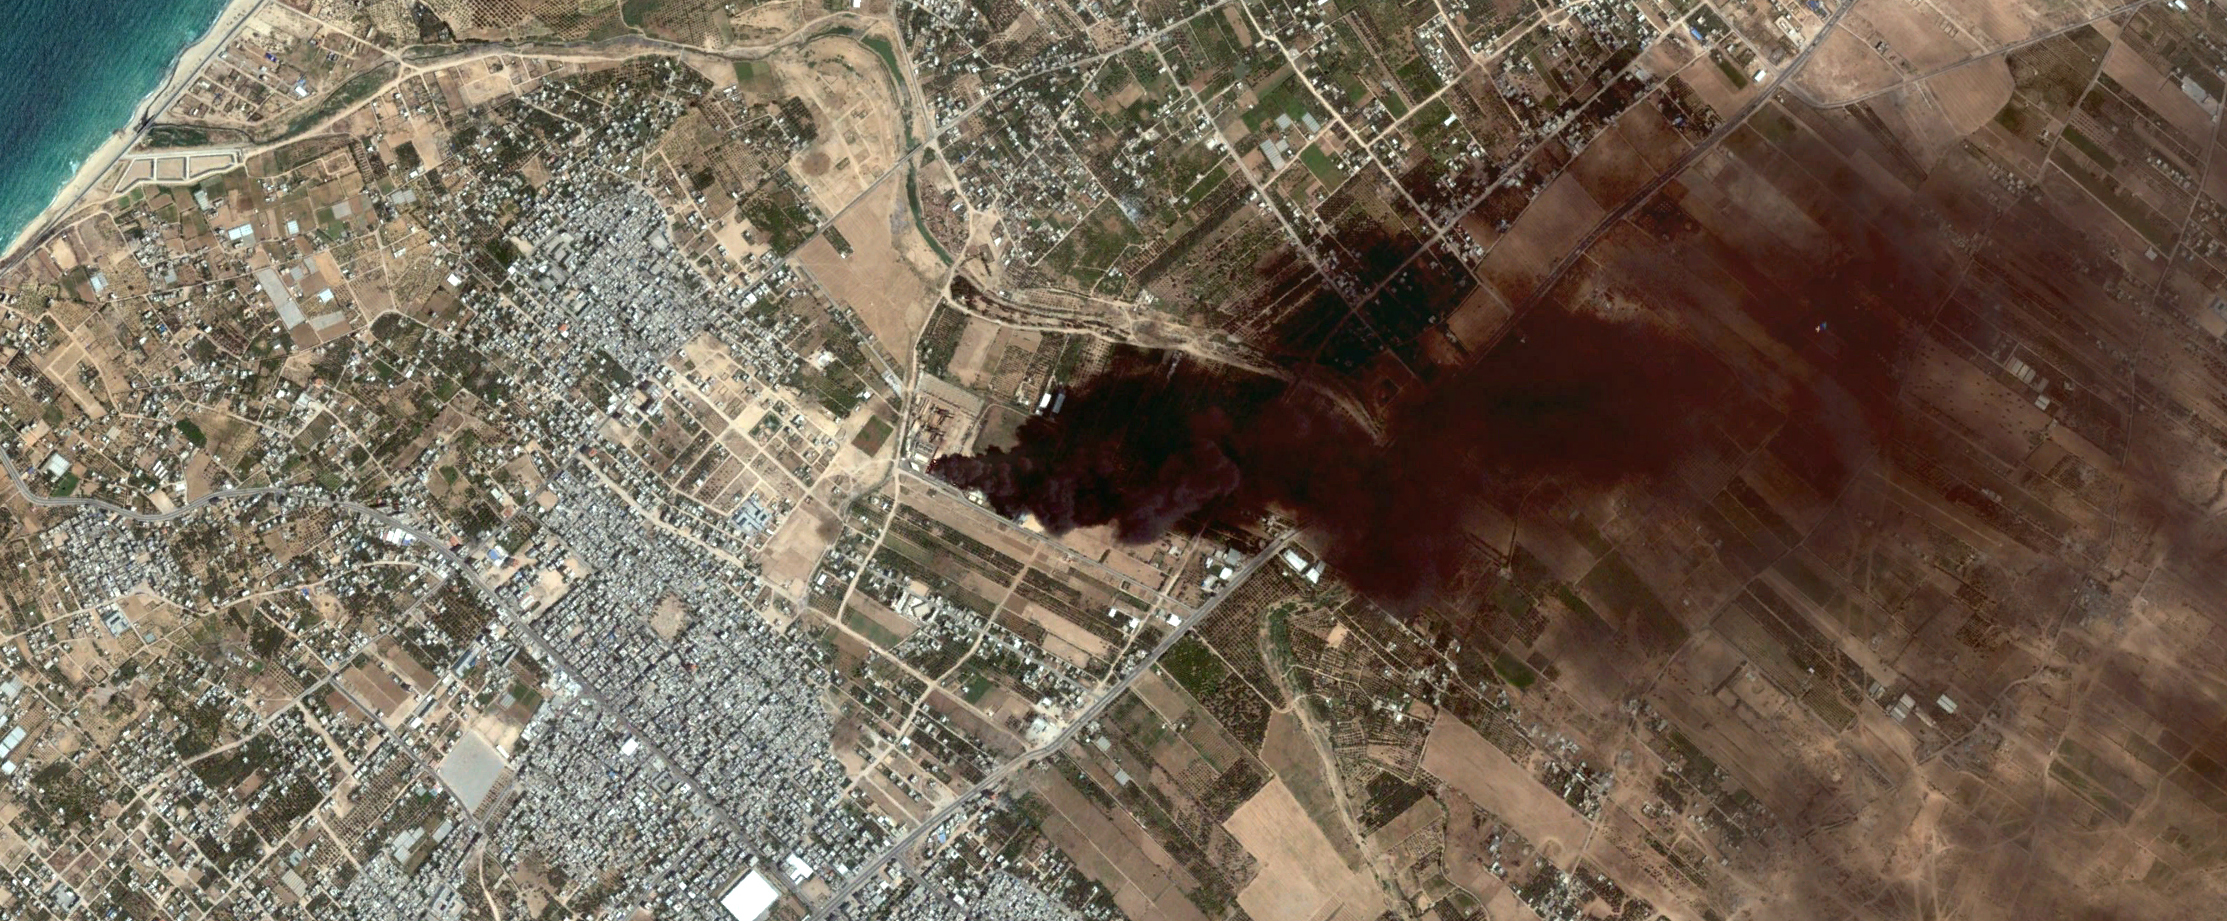 2014_0729 Gaza - Google Earth